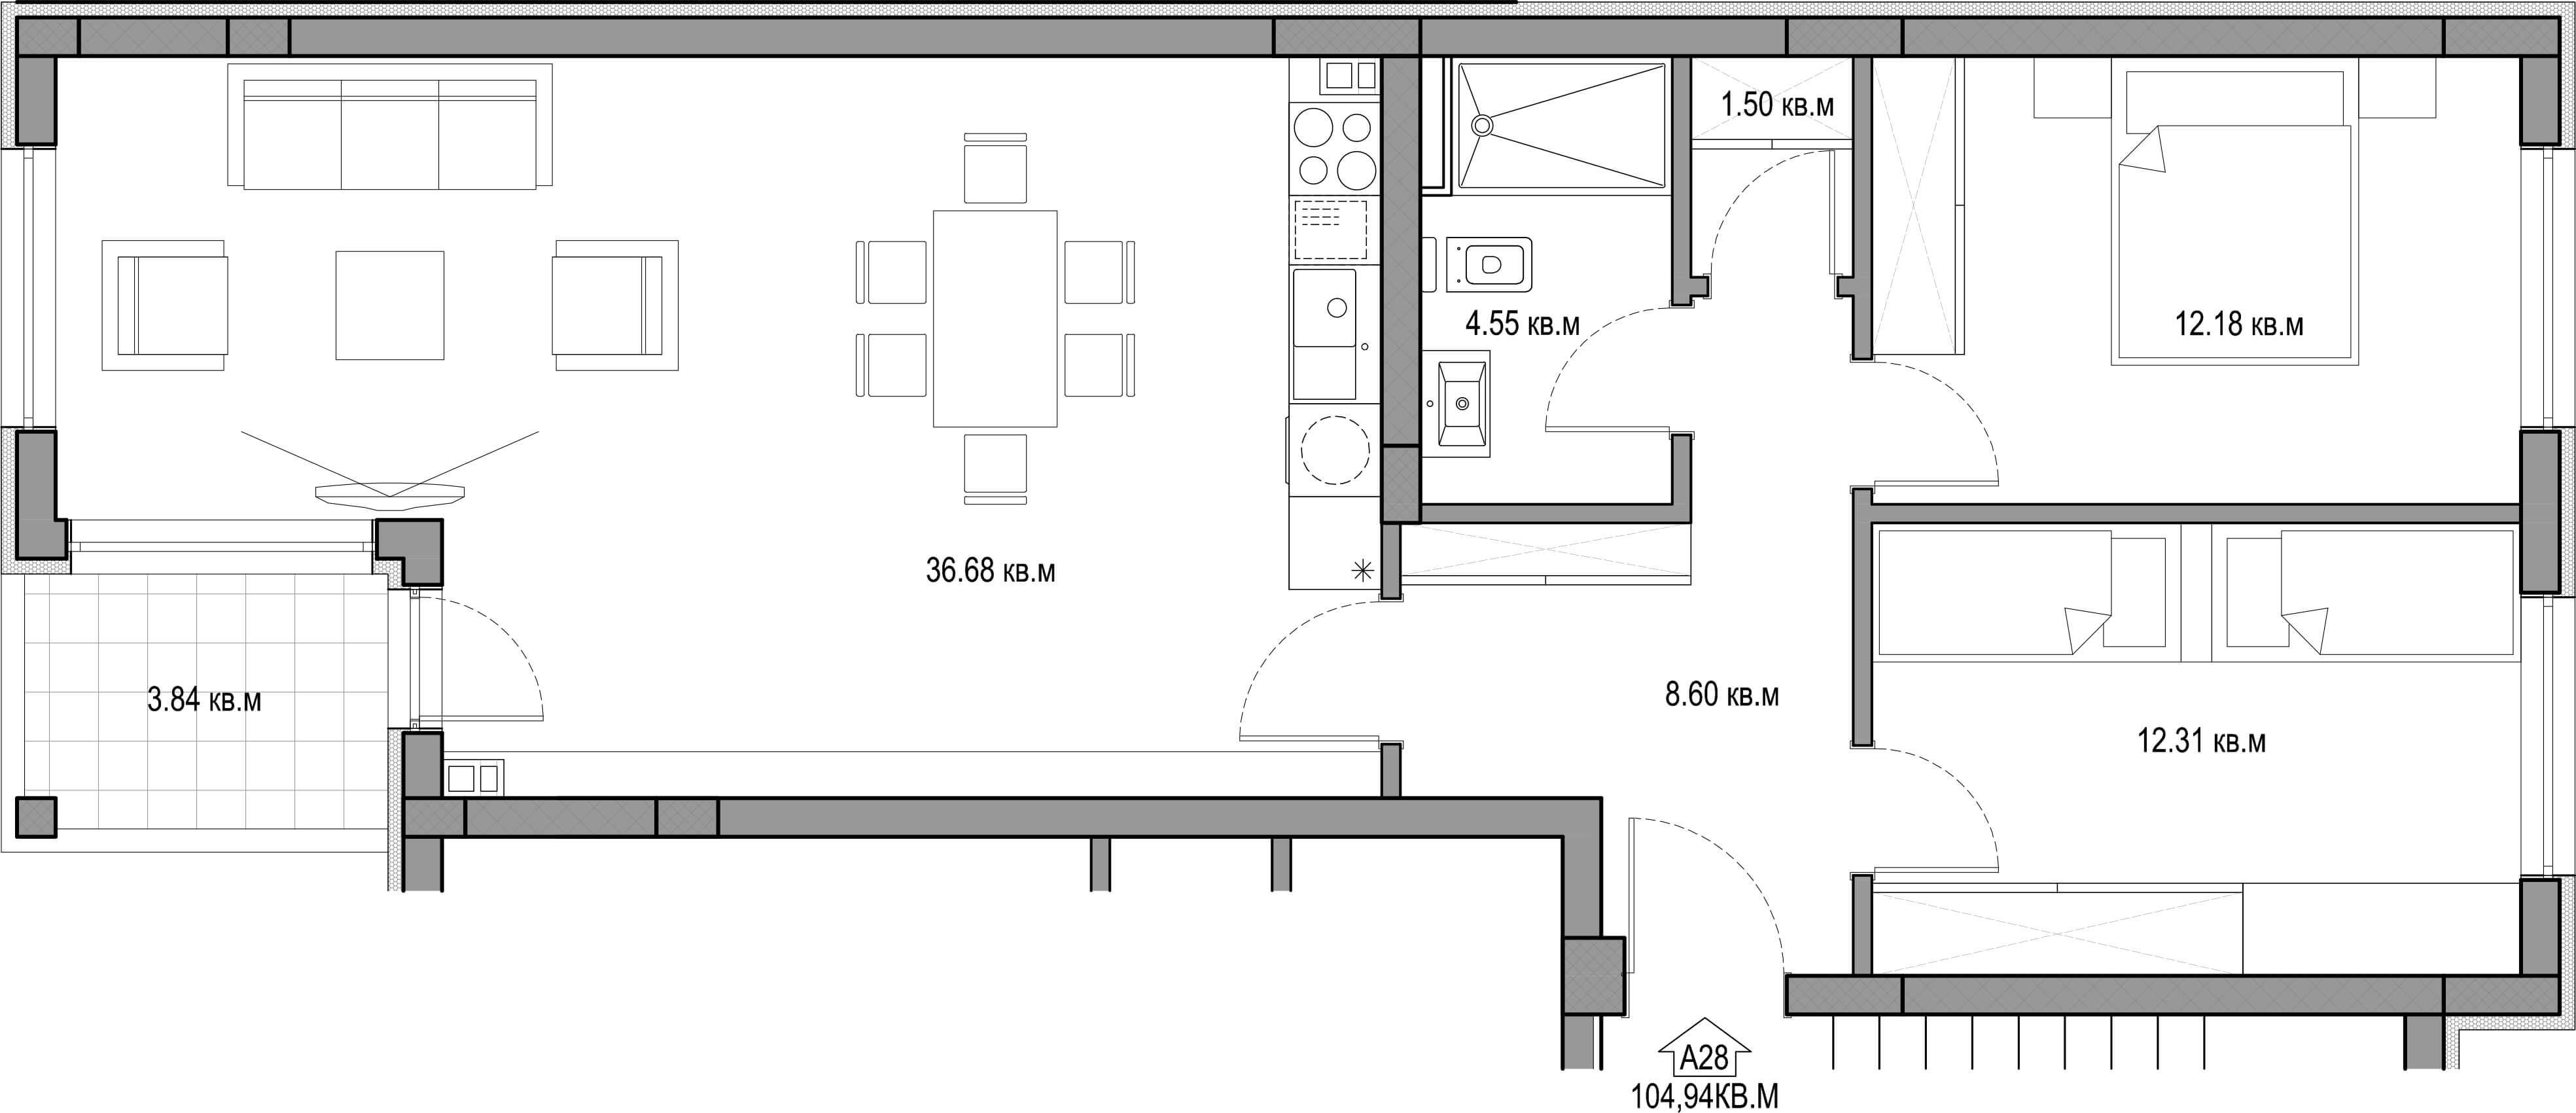 Vinitsa_Apartment_2_28